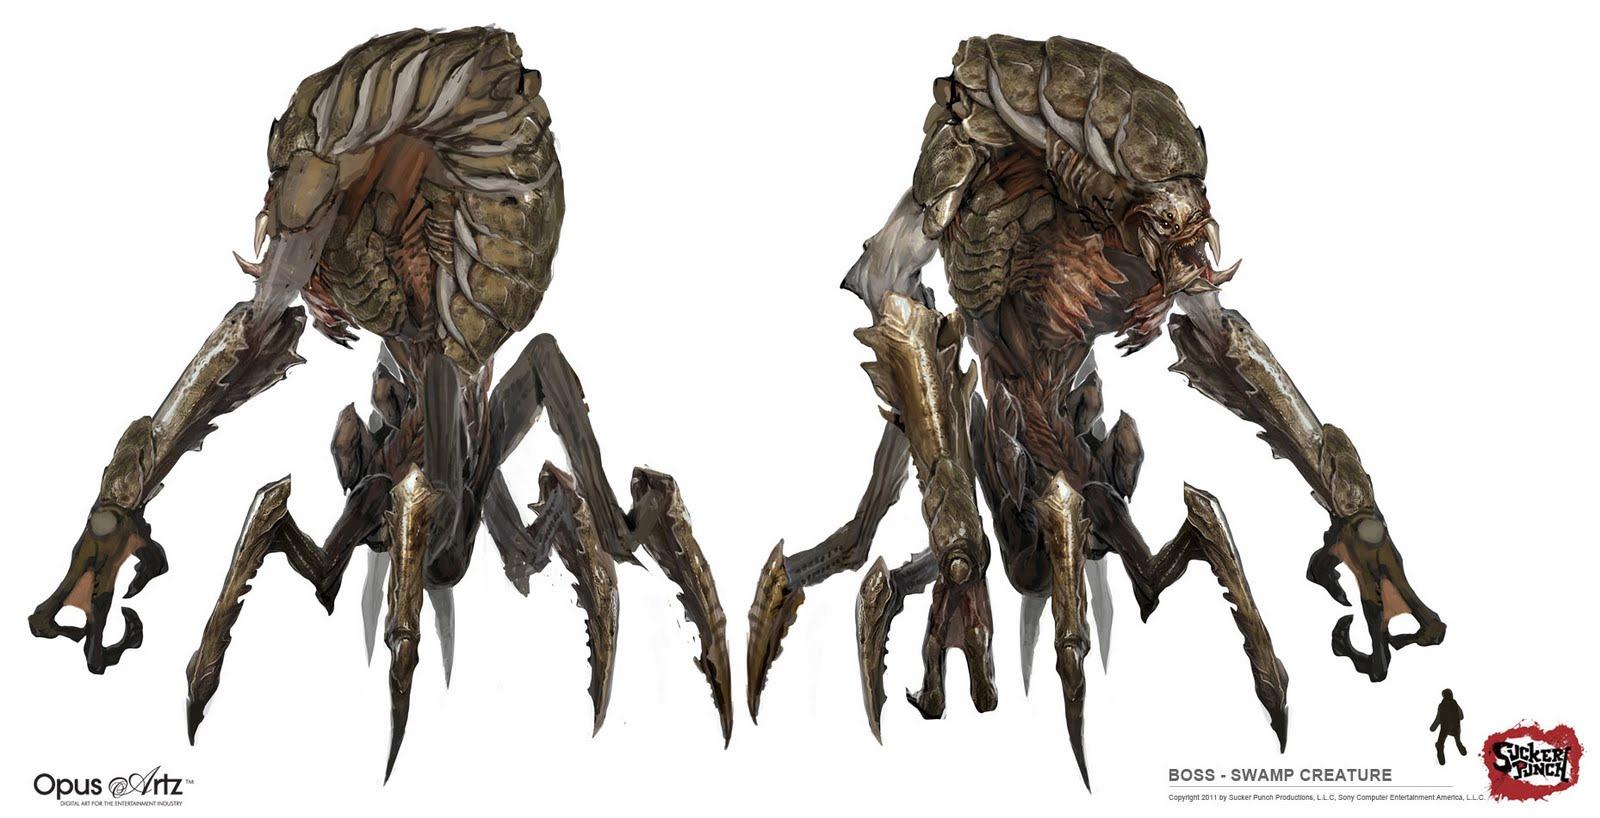 Drawn planets monster Art Concept Creatures Creatures Planet